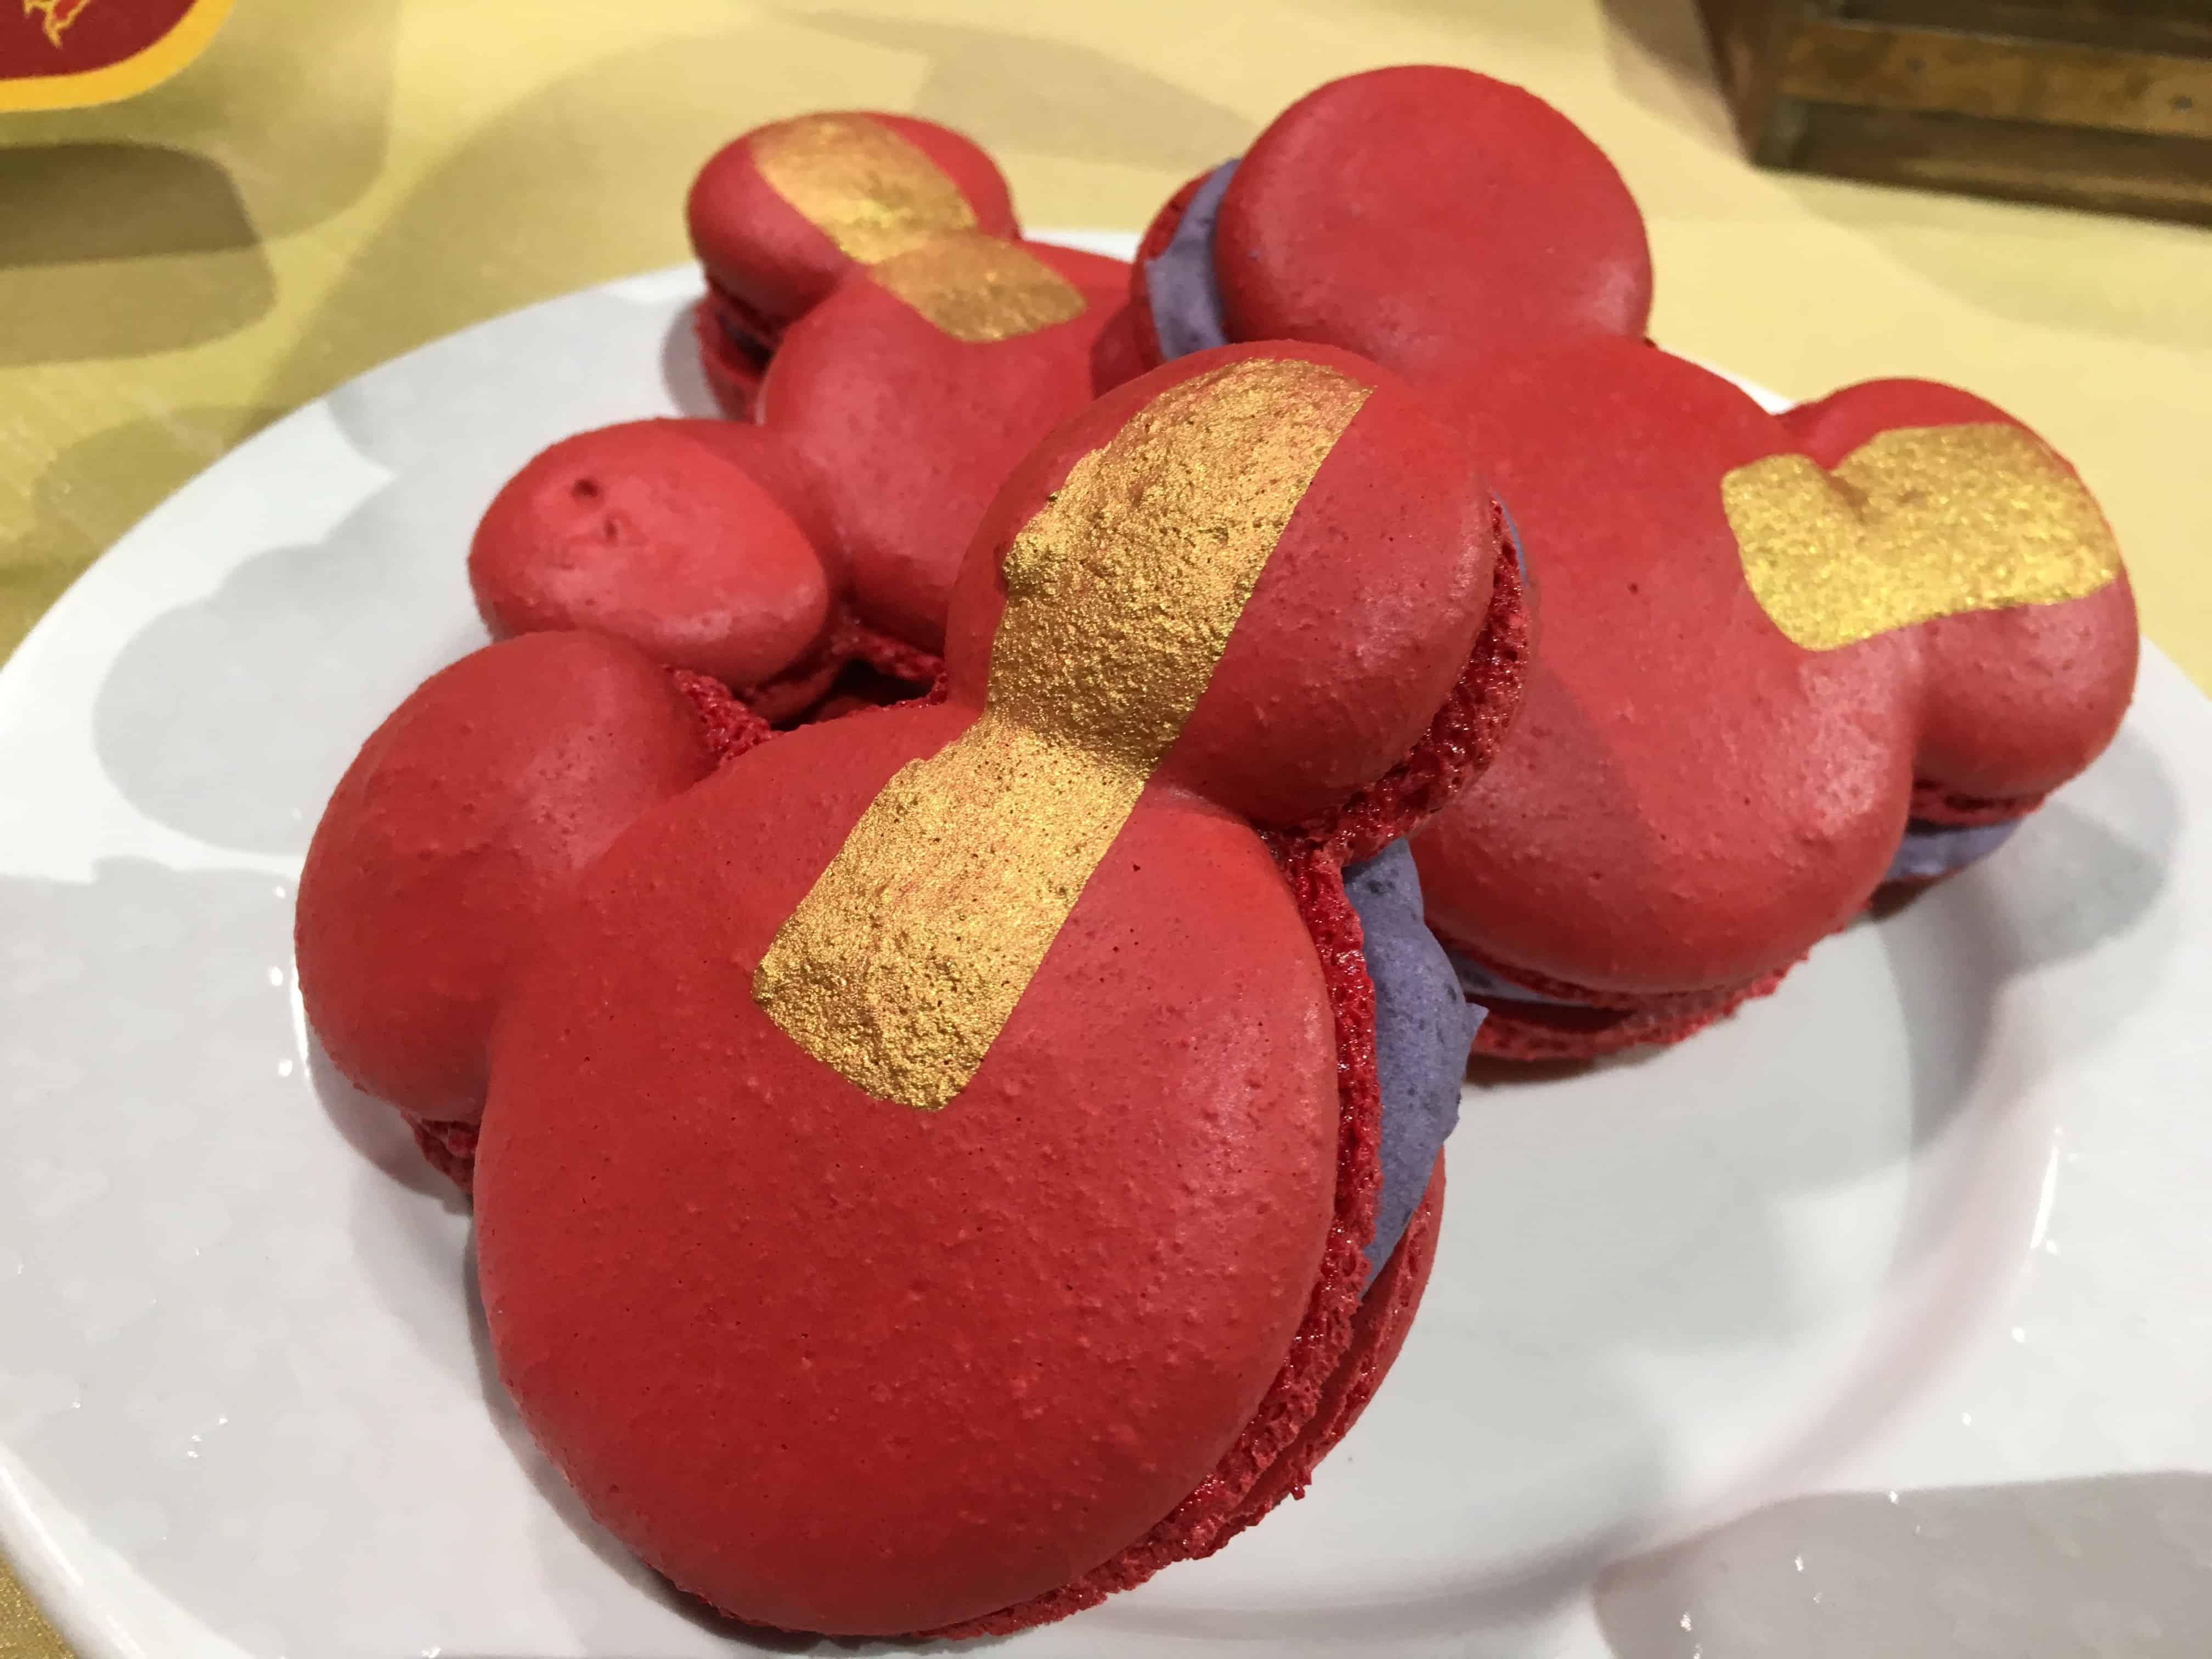 Lunar New Year macaron